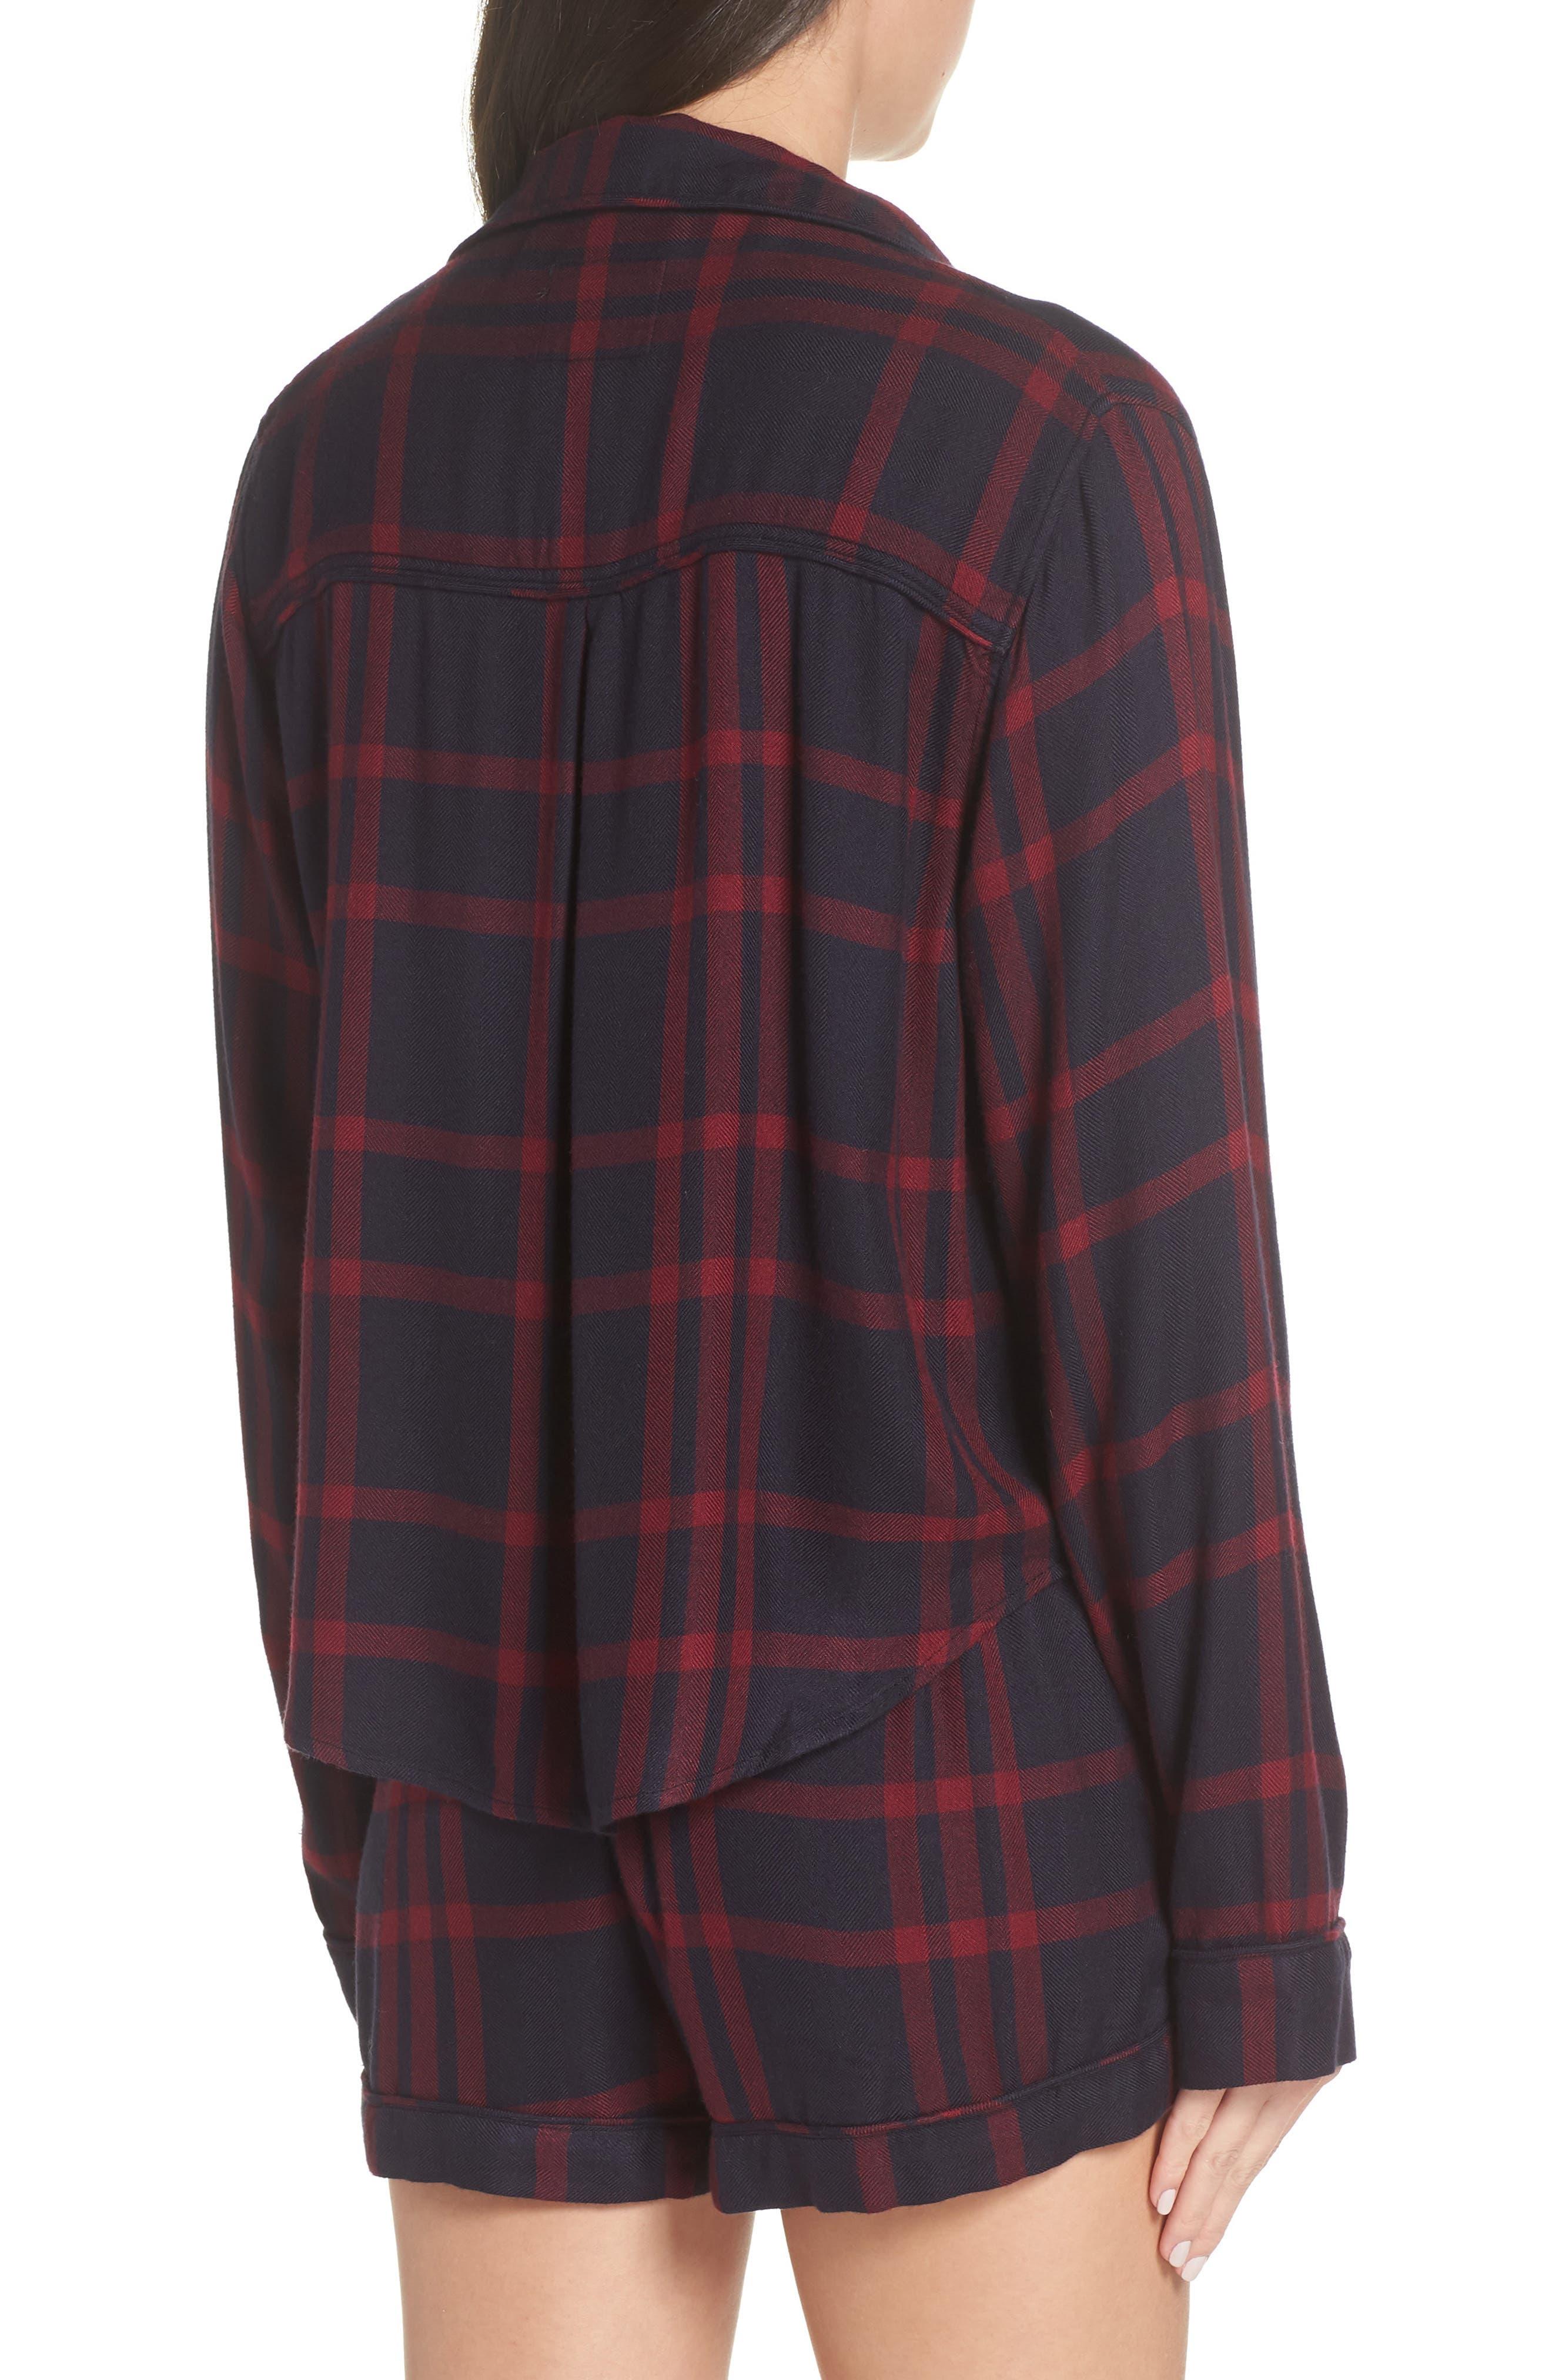 Short Pajamas,                             Alternate thumbnail 2, color,                             BLACK CHERRY